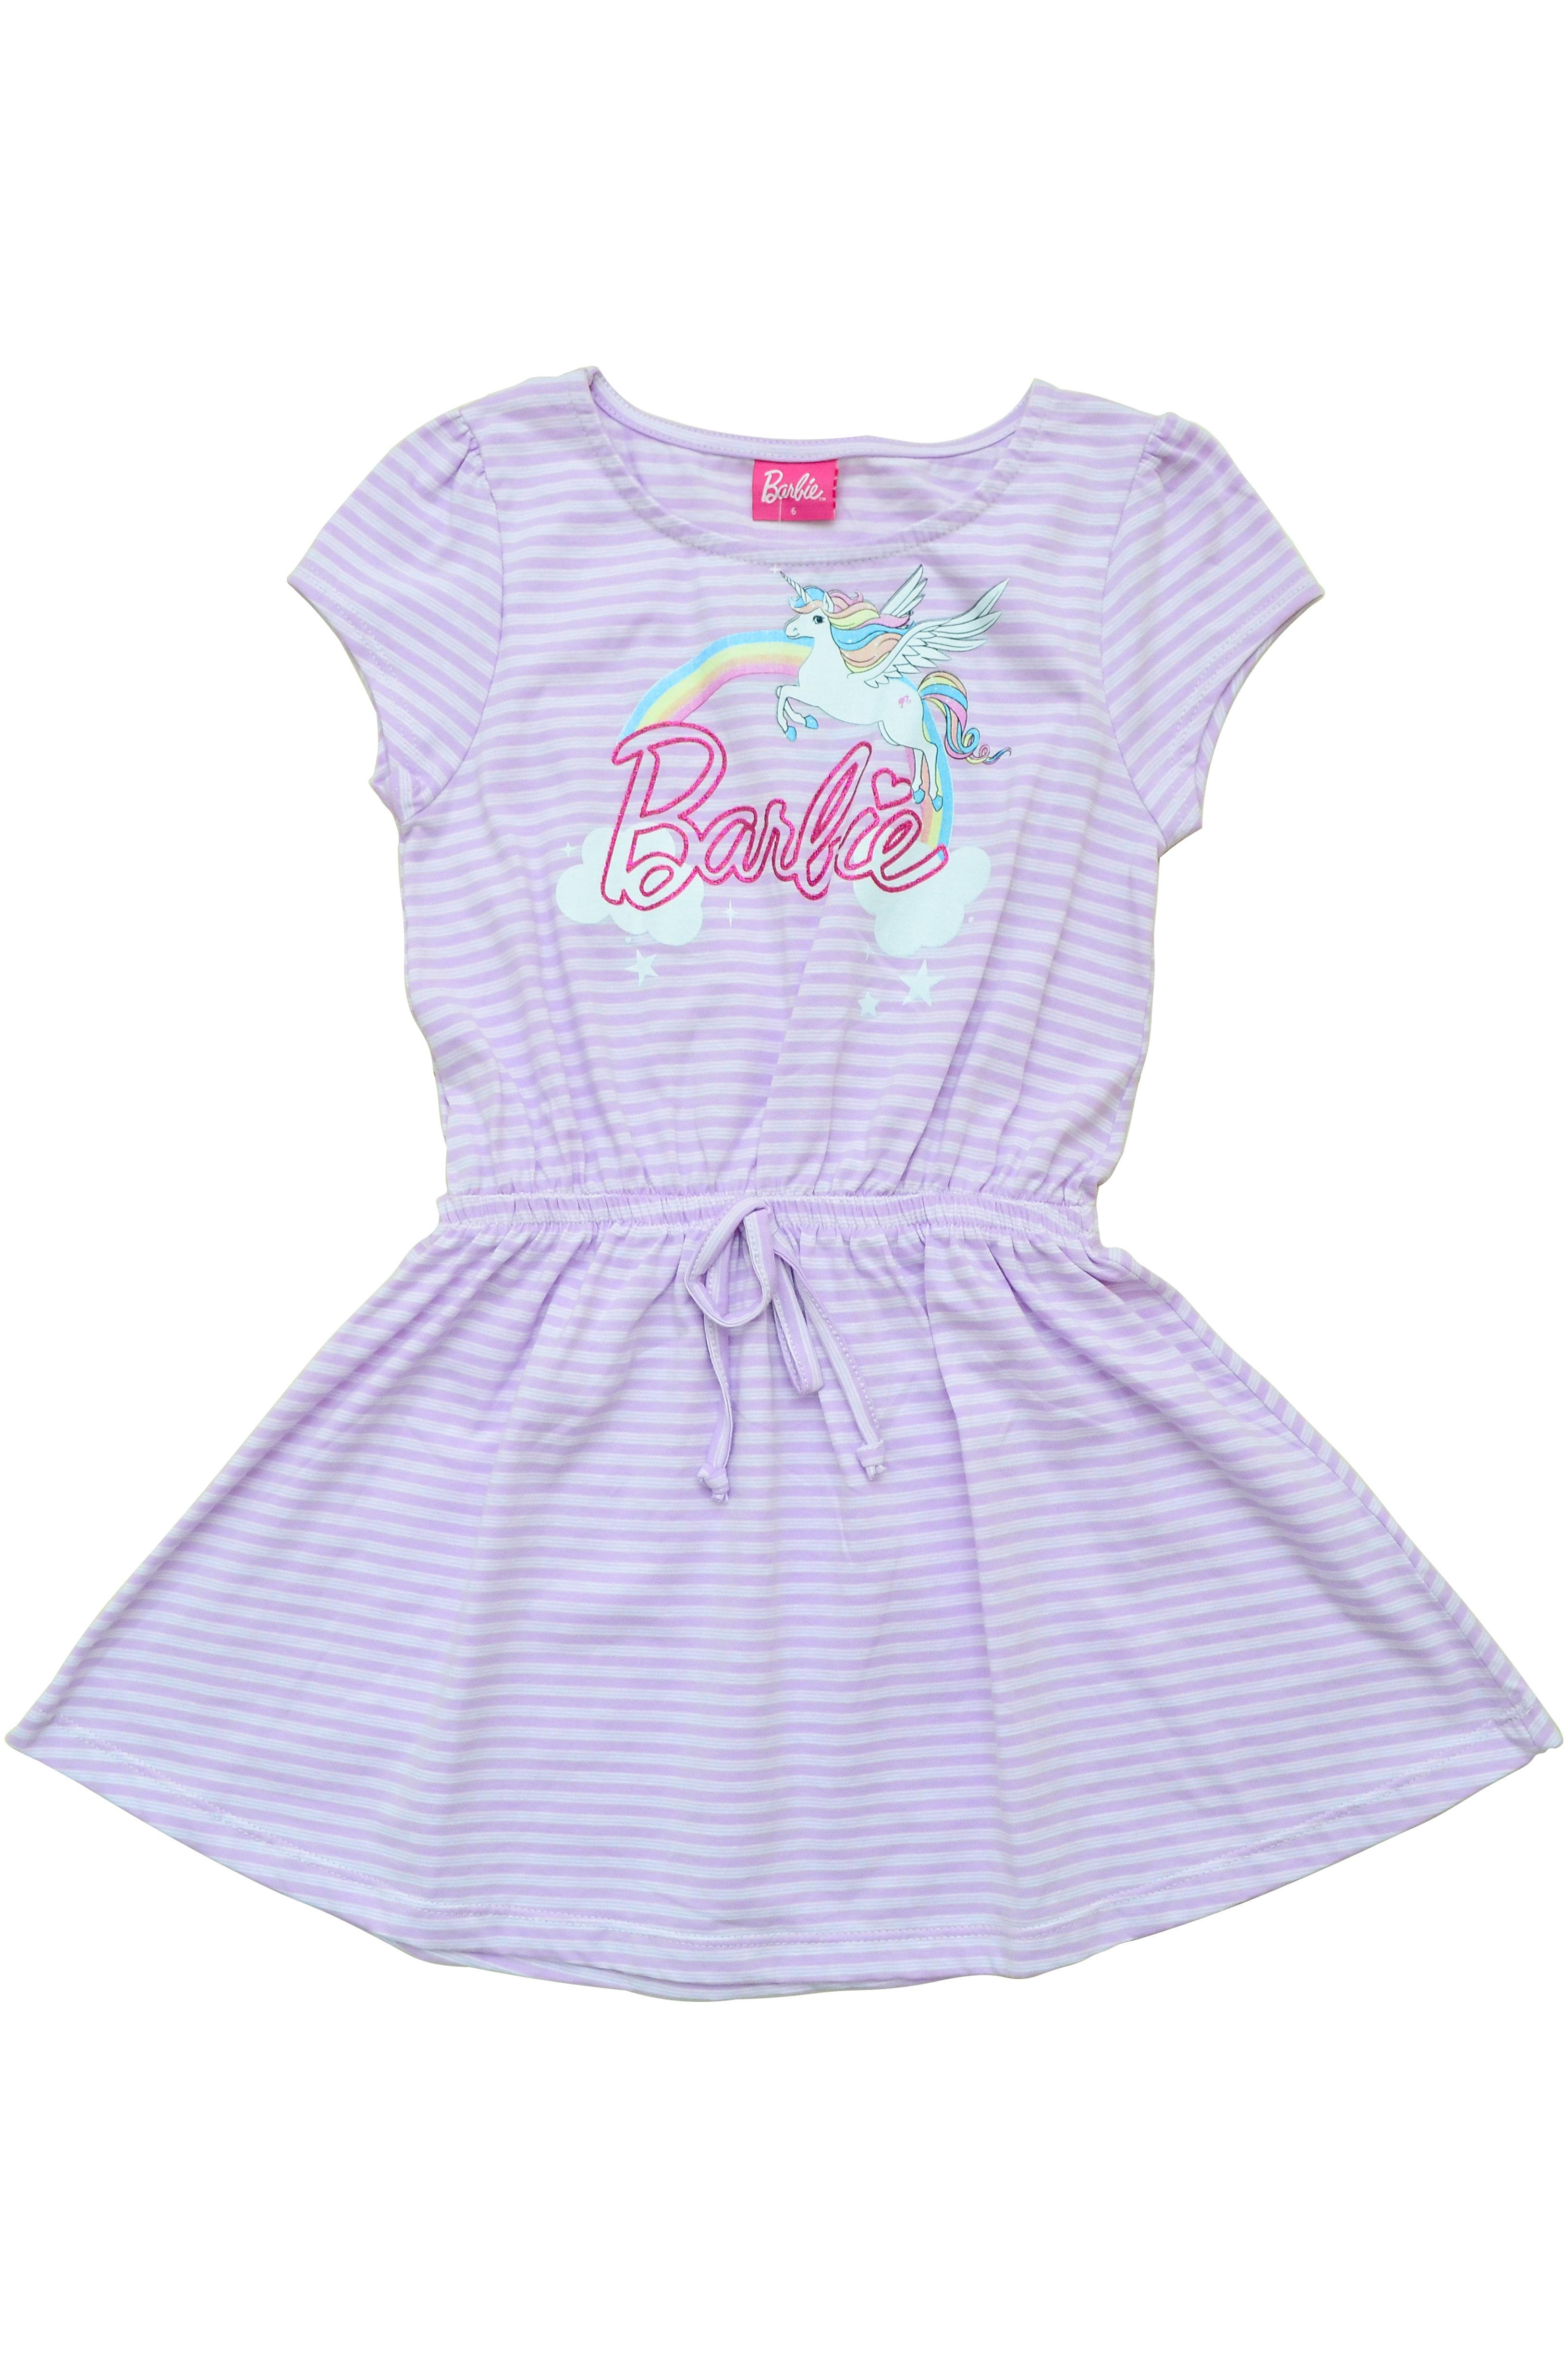 ccb124b2bf8bdd Vestido Listrado Barbie Lilás - Fakini Kids Disney